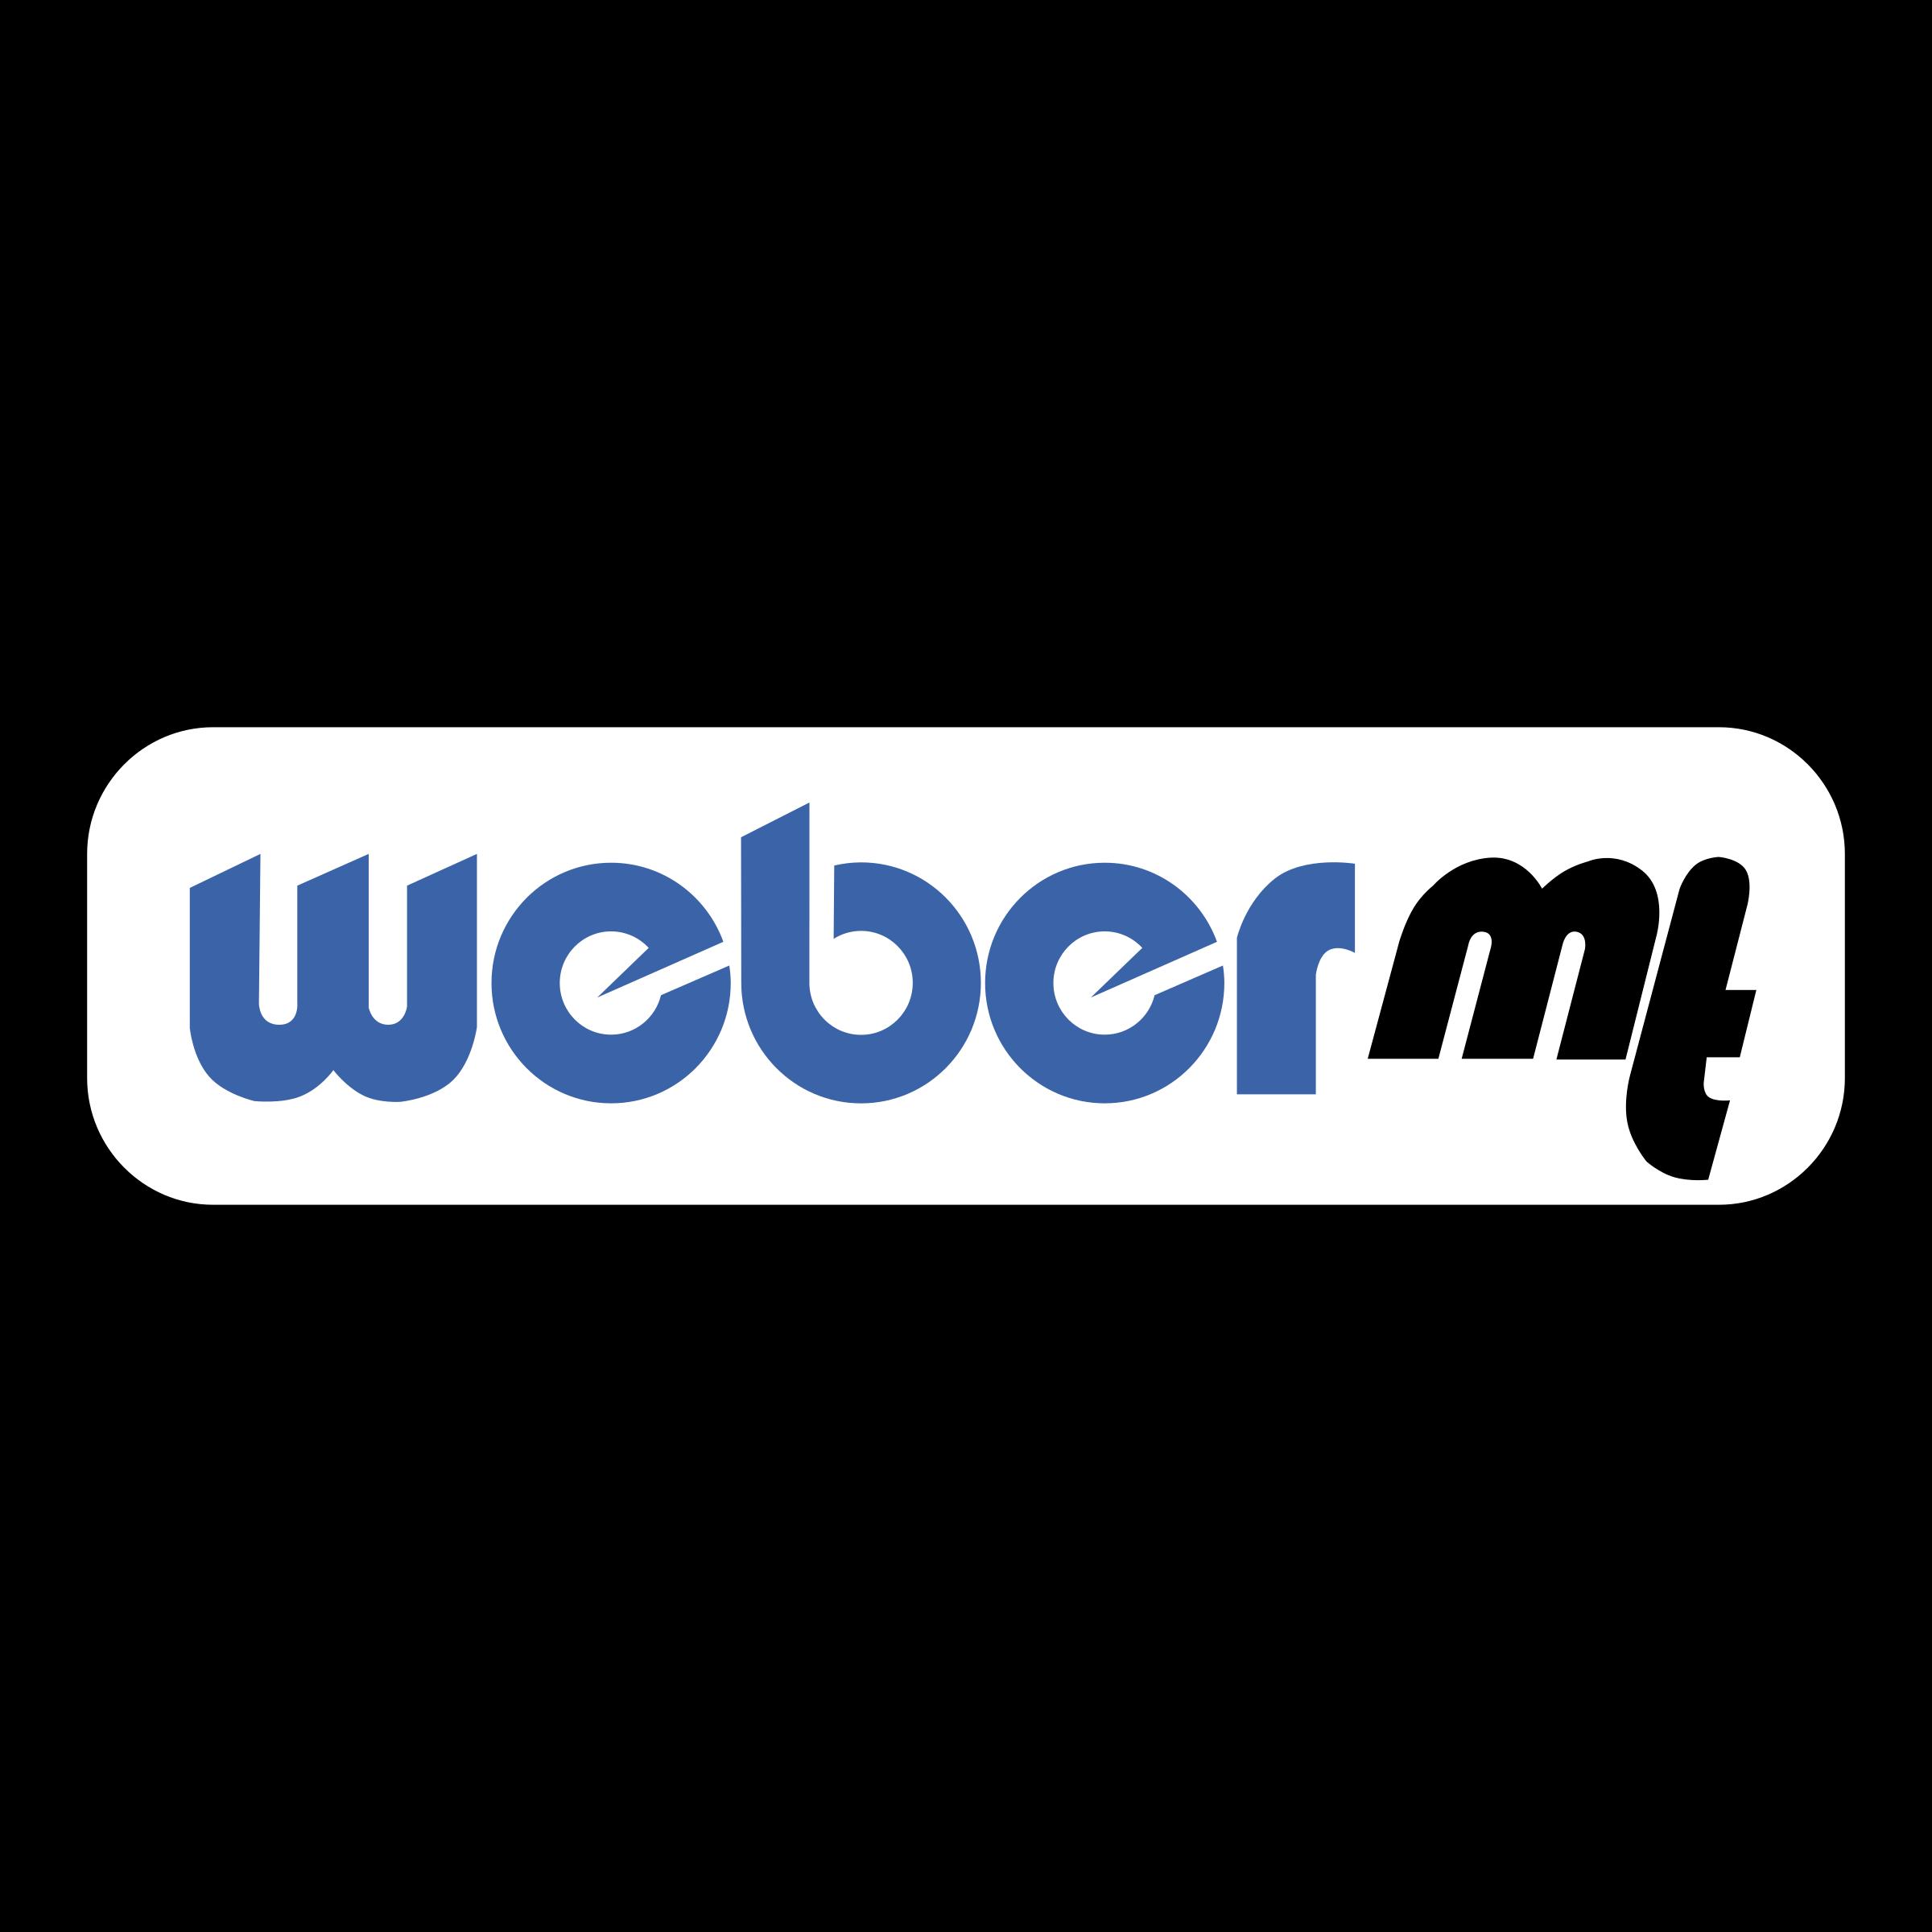 Weber- Starke Marke bei IMA.png